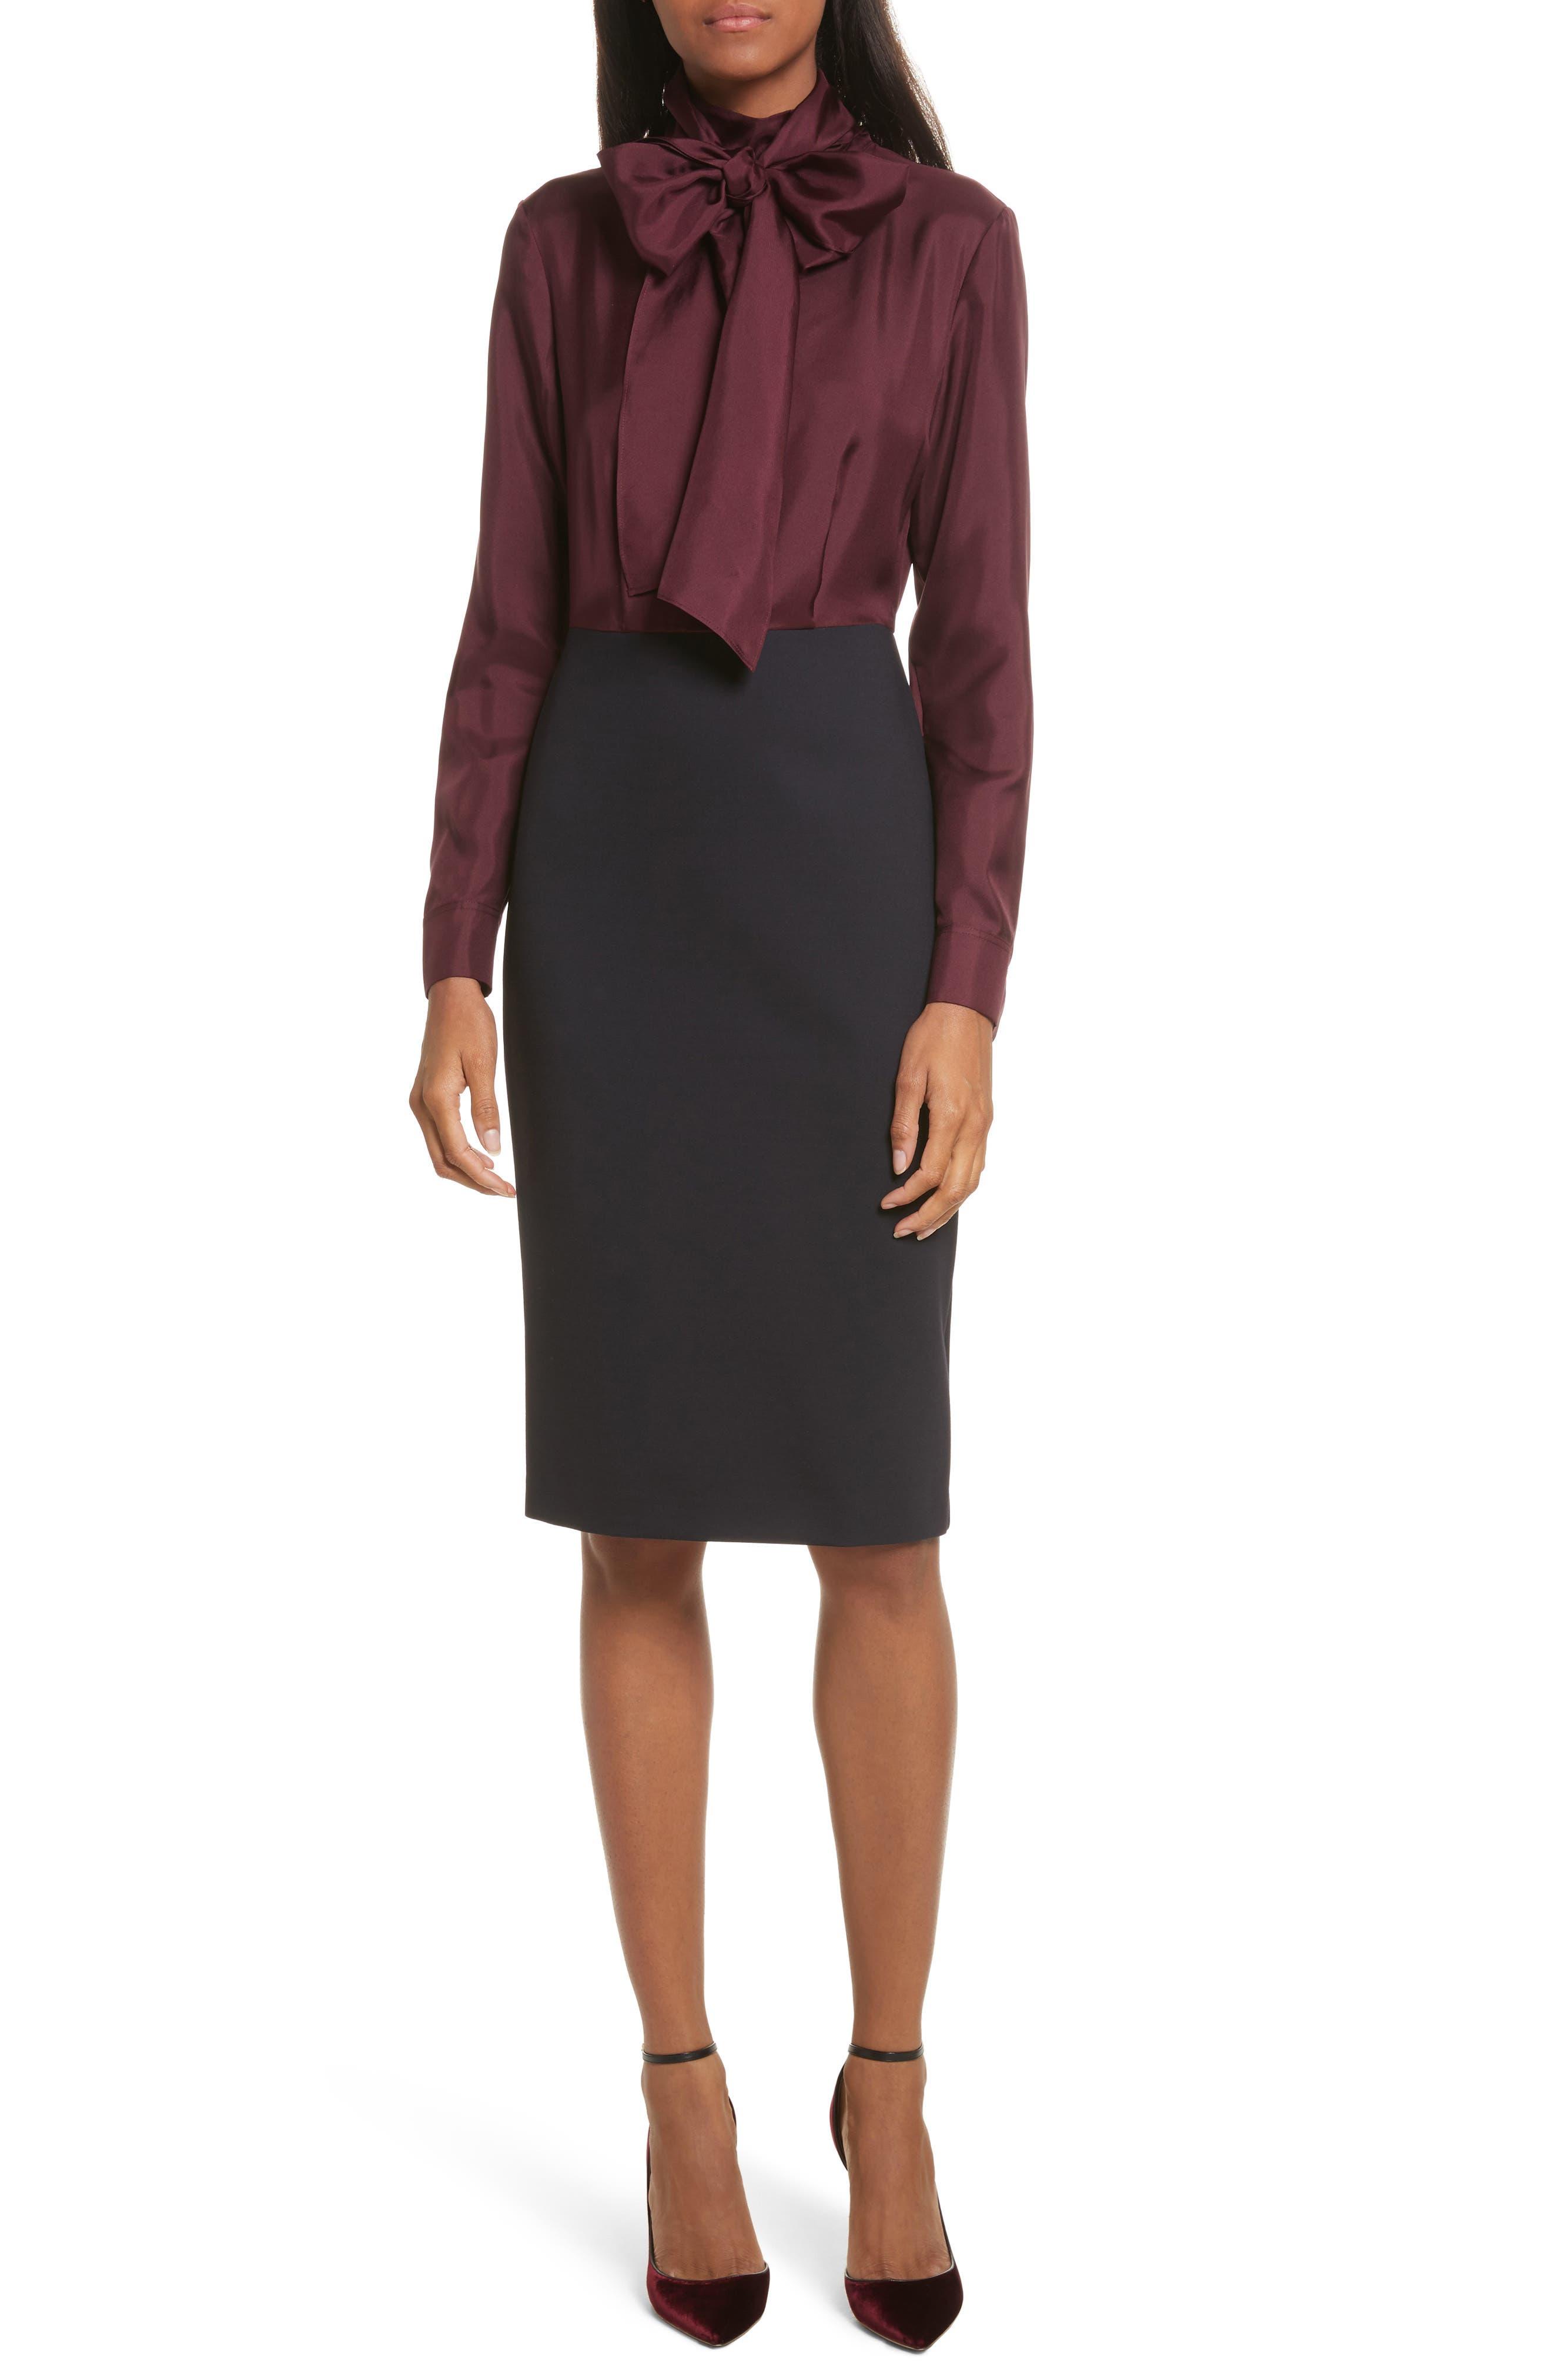 Jensah Tie Neck Mixed Media Dress,                             Main thumbnail 1, color,                             Dark Blue